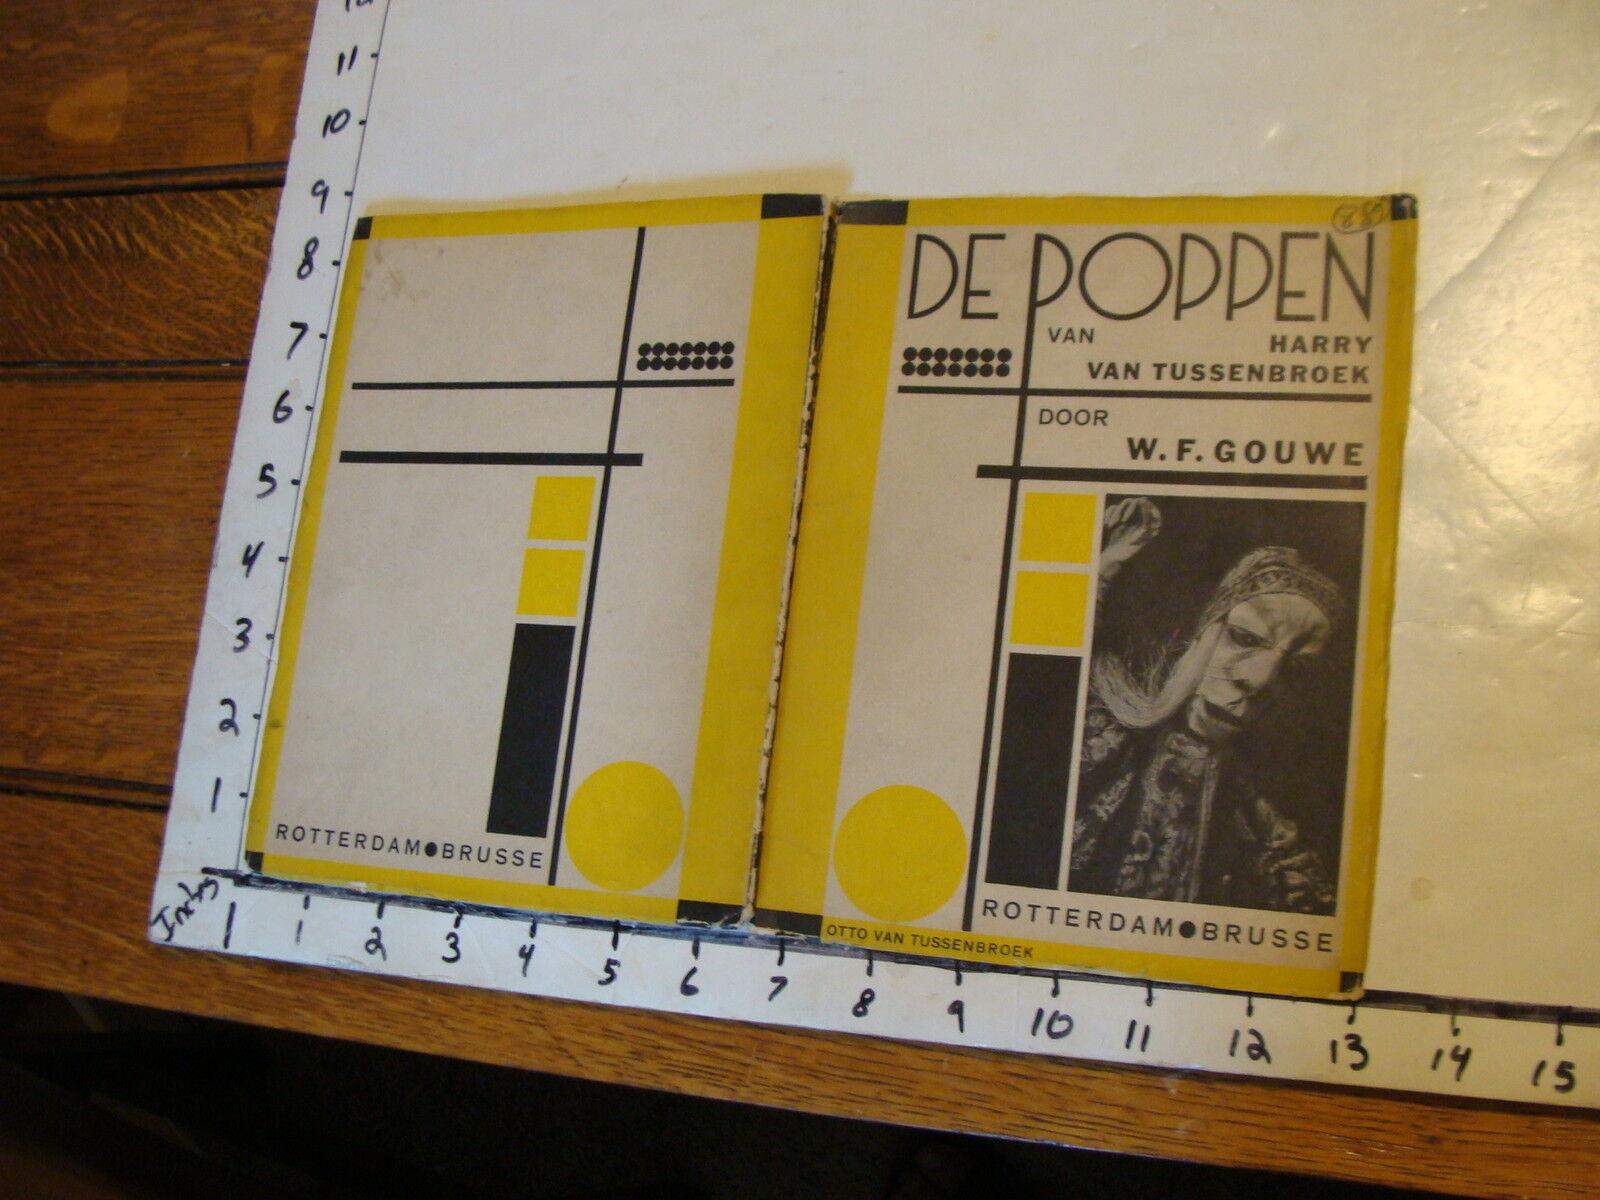 Vintage MARIONETTE Play   rare DE POPPEN VAN HARRY VAN TUSSENBROEK  garanzia di qualità